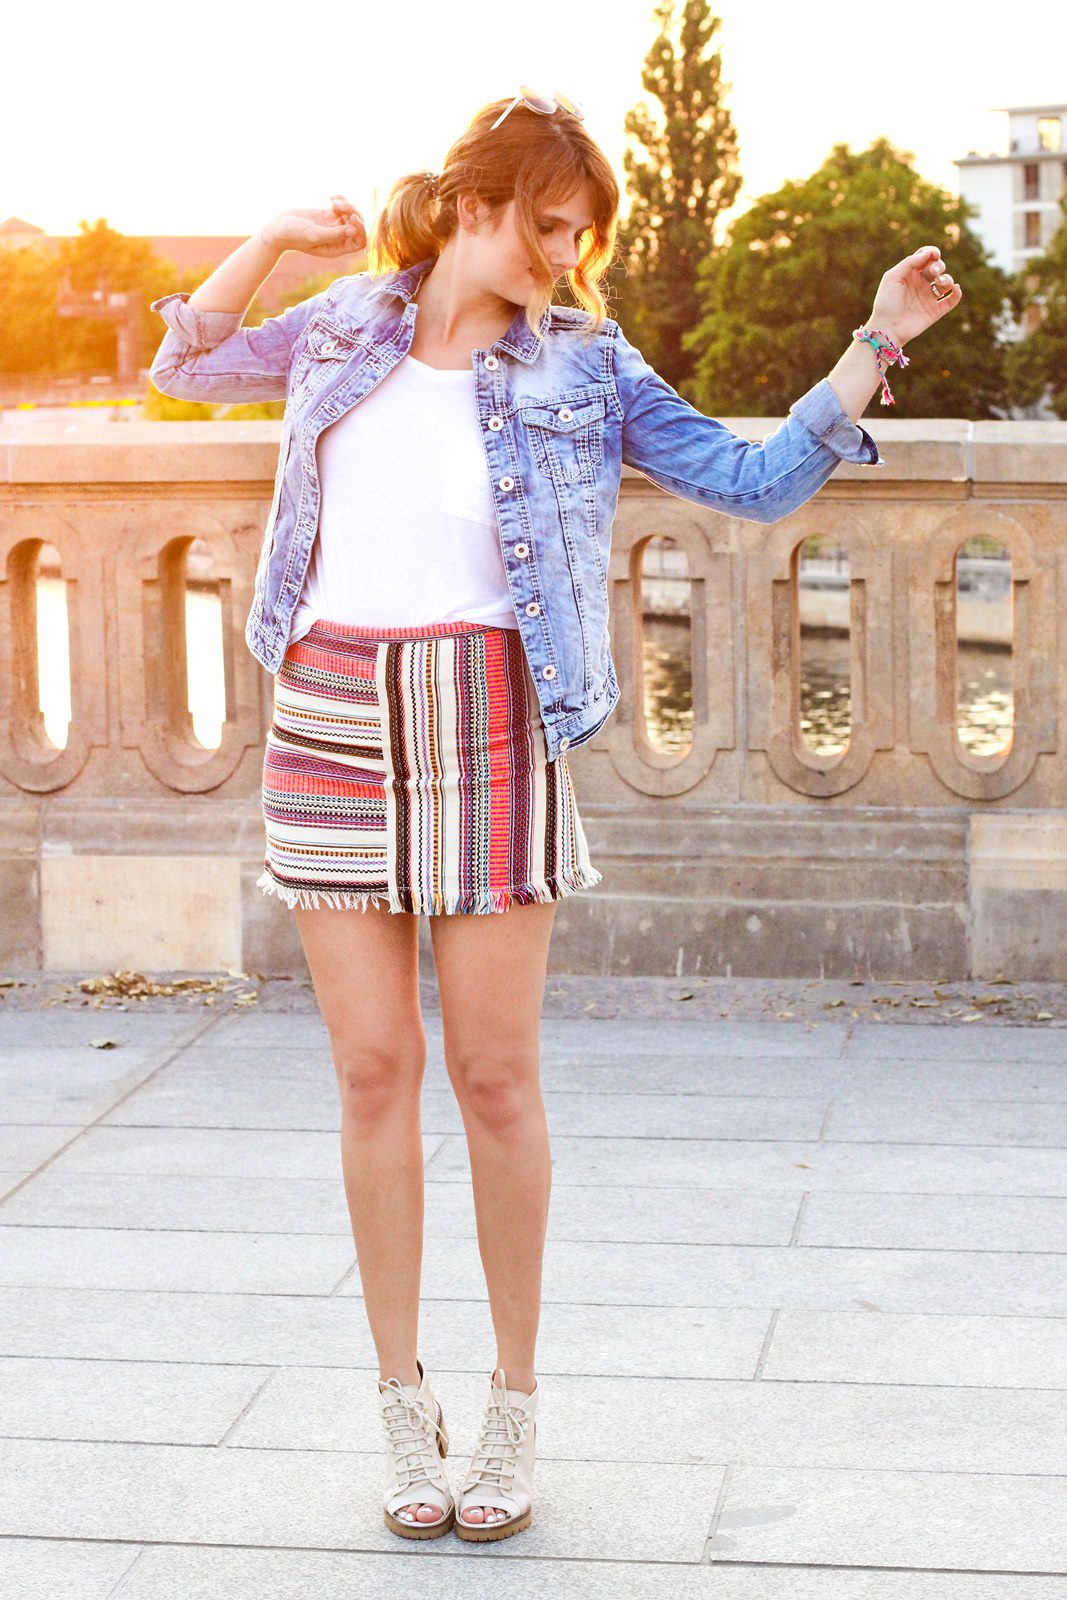 desbelleschoses-jeansjacke-runde-sonnenbrille-weißes-tshirt-sommer-berlin-museumsmeile 7